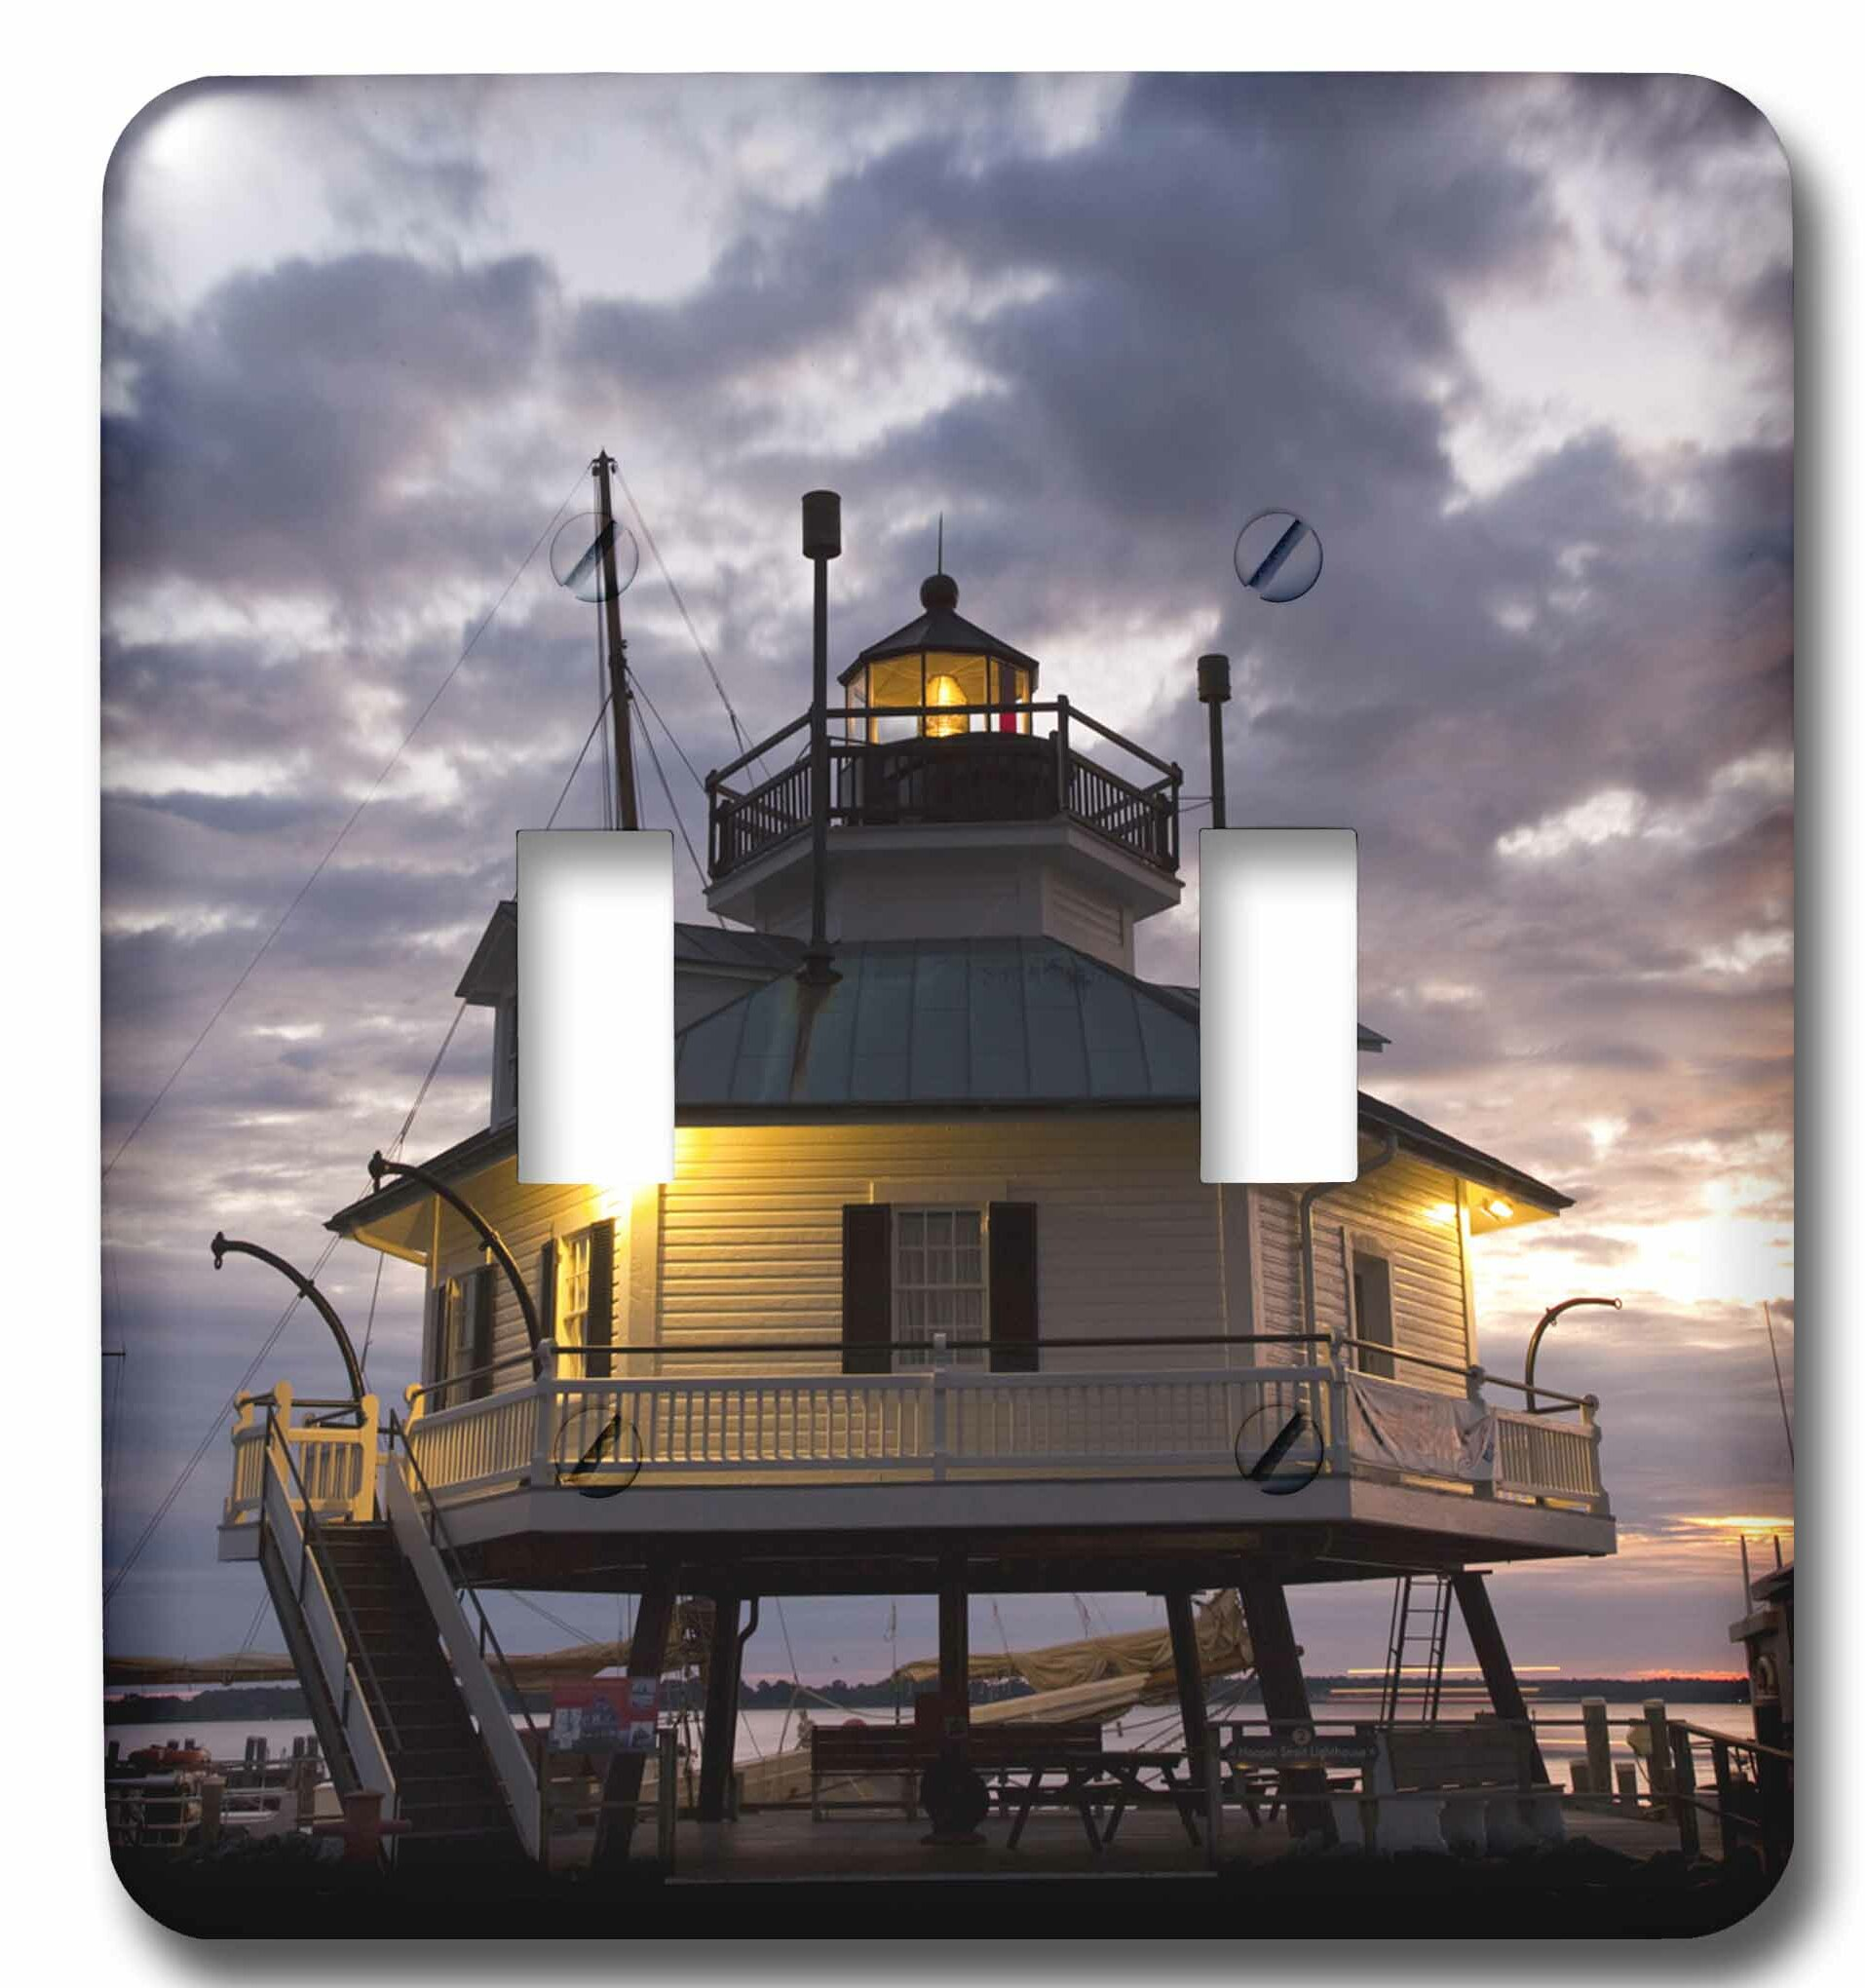 3drose Chesapeake Bay Hooper Straight Lighthouse 2 Gang Toggle Light Switch Wall Plate Wayfair